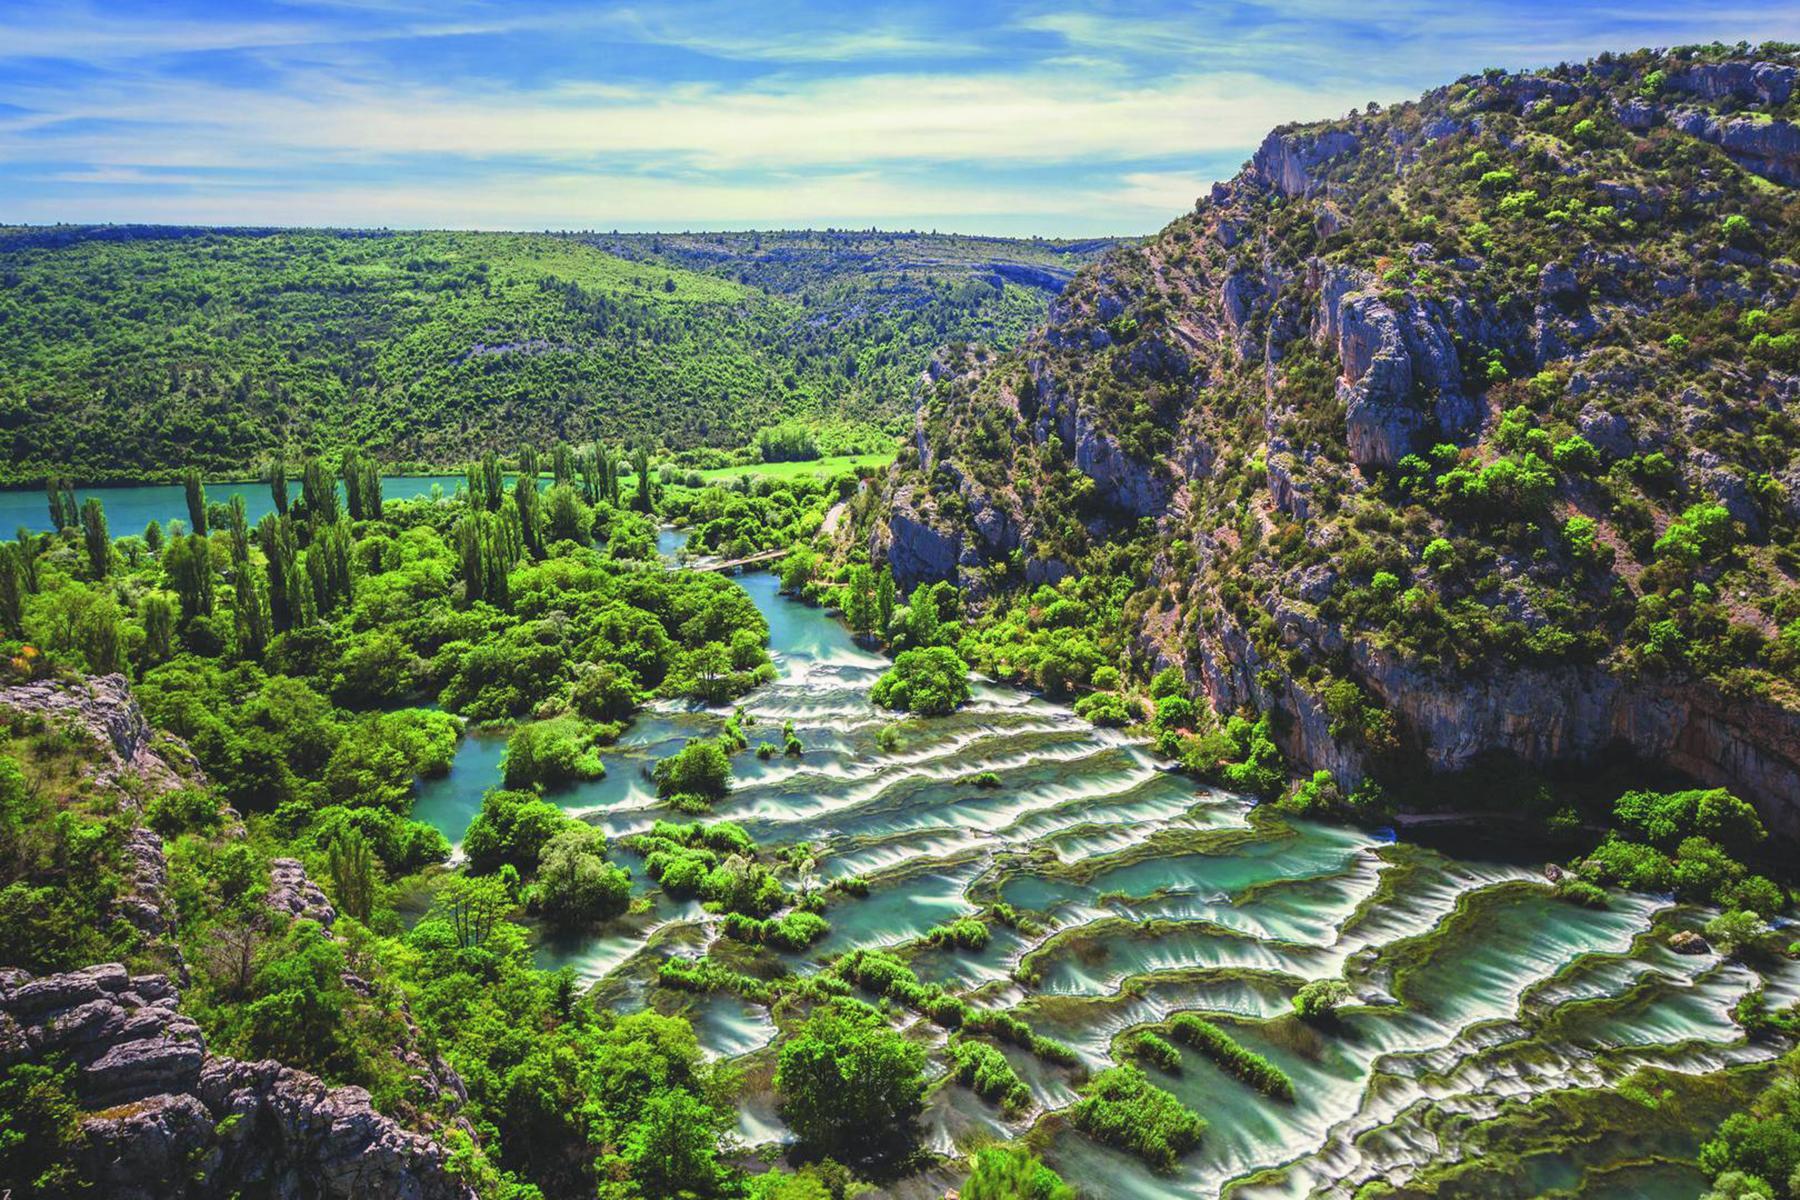 Croatia's Startlingly Beautiful National Parks, Ranked